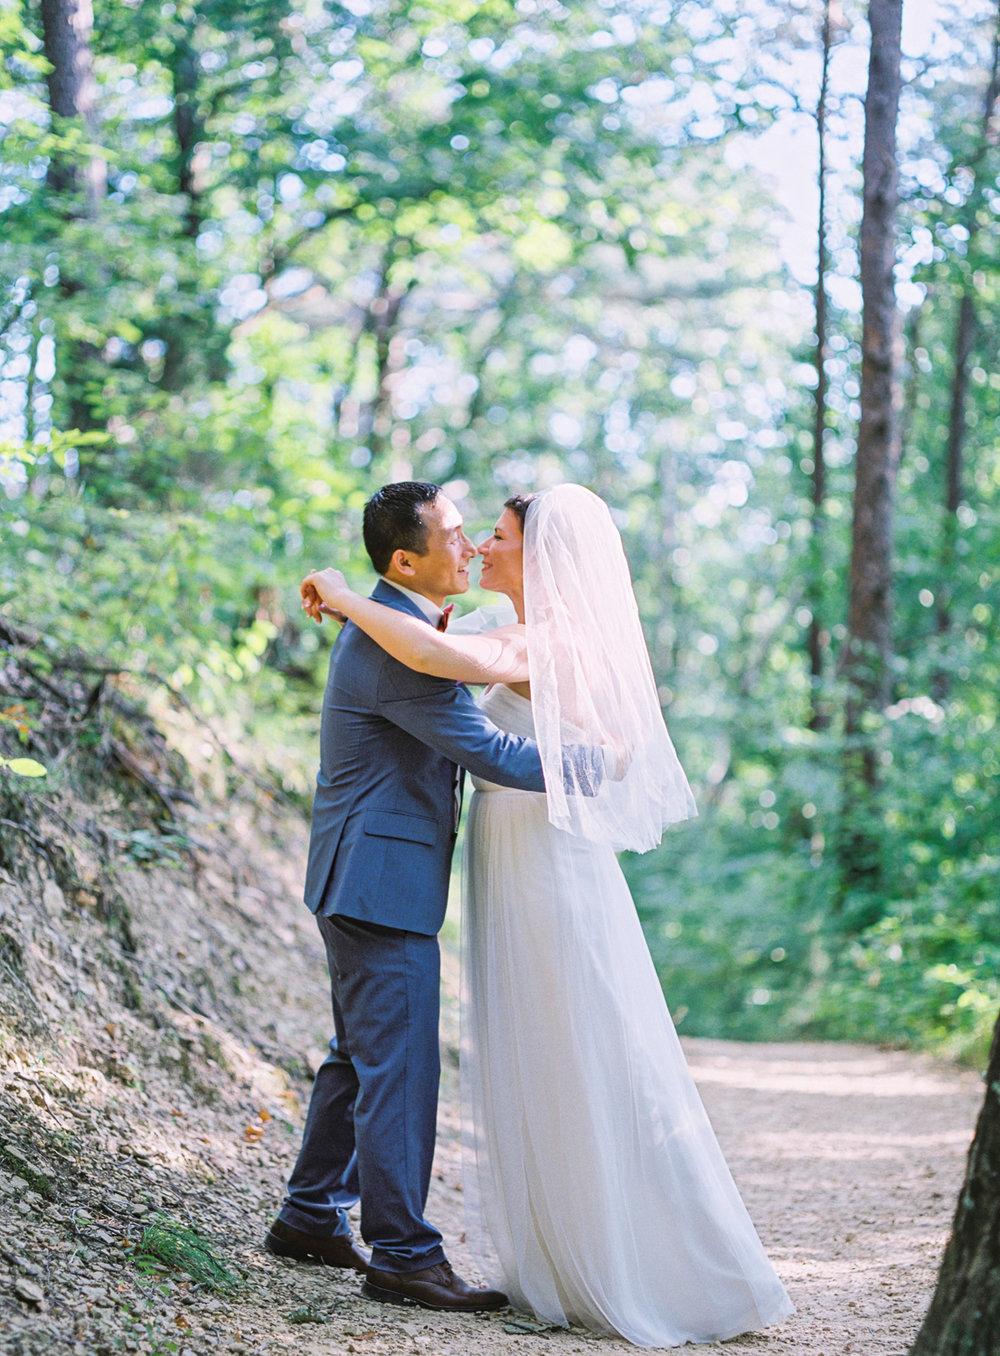 Leaf-&-Pine-Lindsey-Kaiphen-Wedding-41.jpg